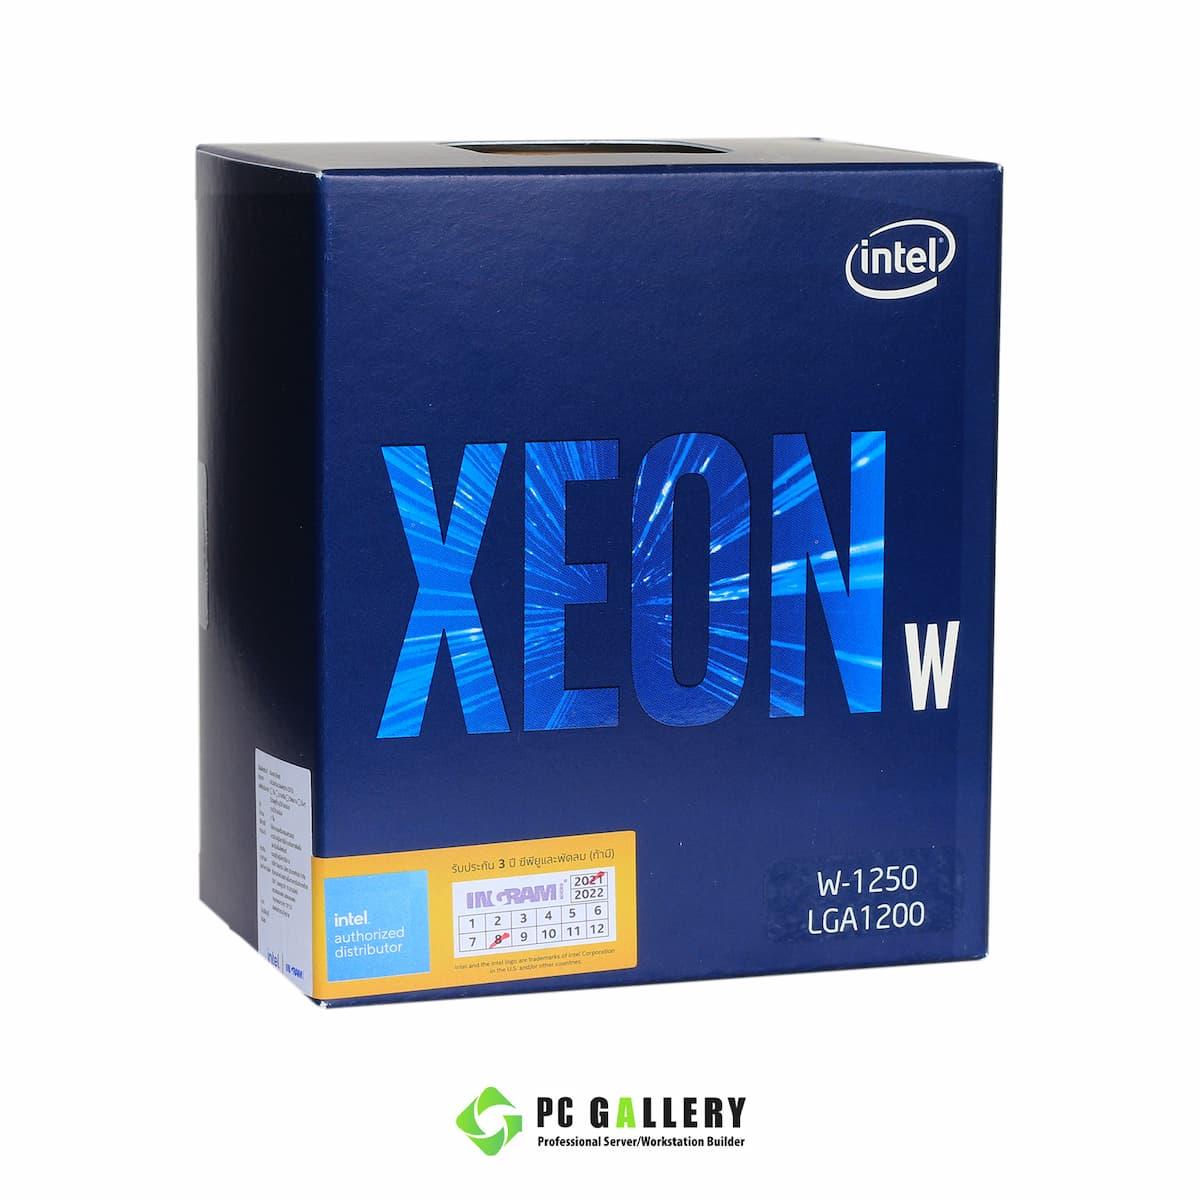 Intel-Xeon-W-1250